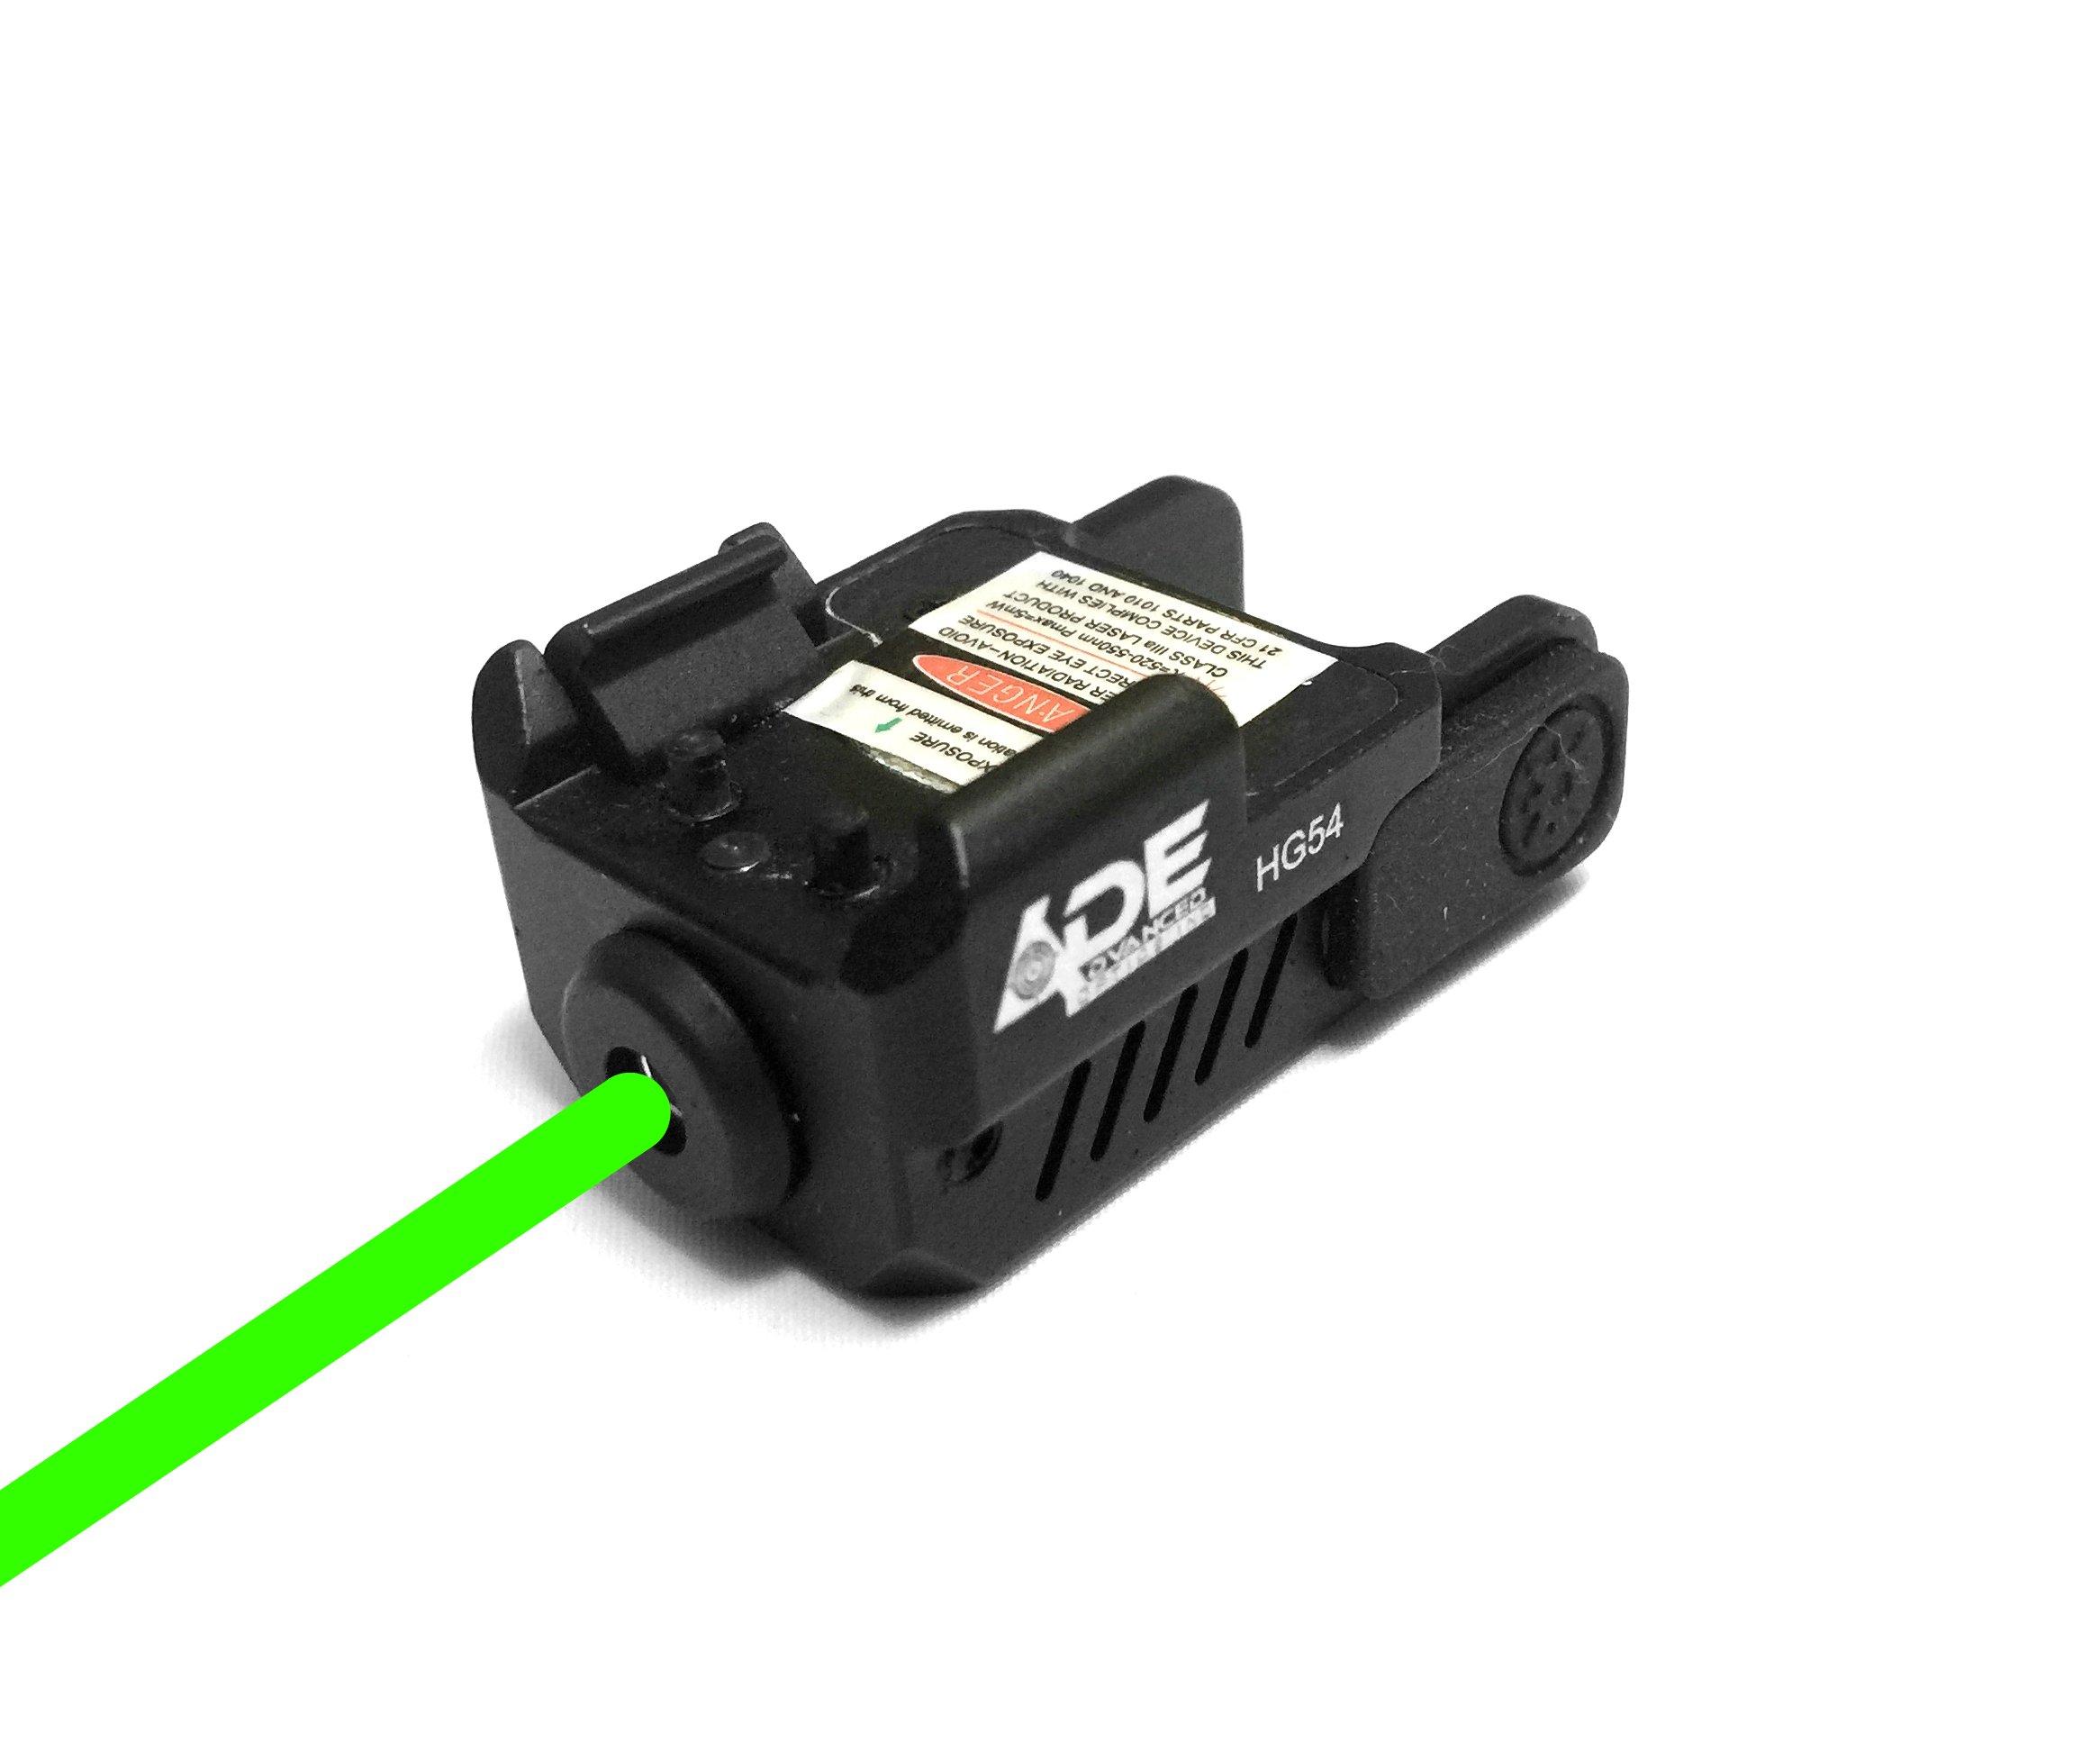 Ade Advanced Optics HG54G Strobe Laser Sight for Pistol Handgun, Green by Ade Advanced Optics